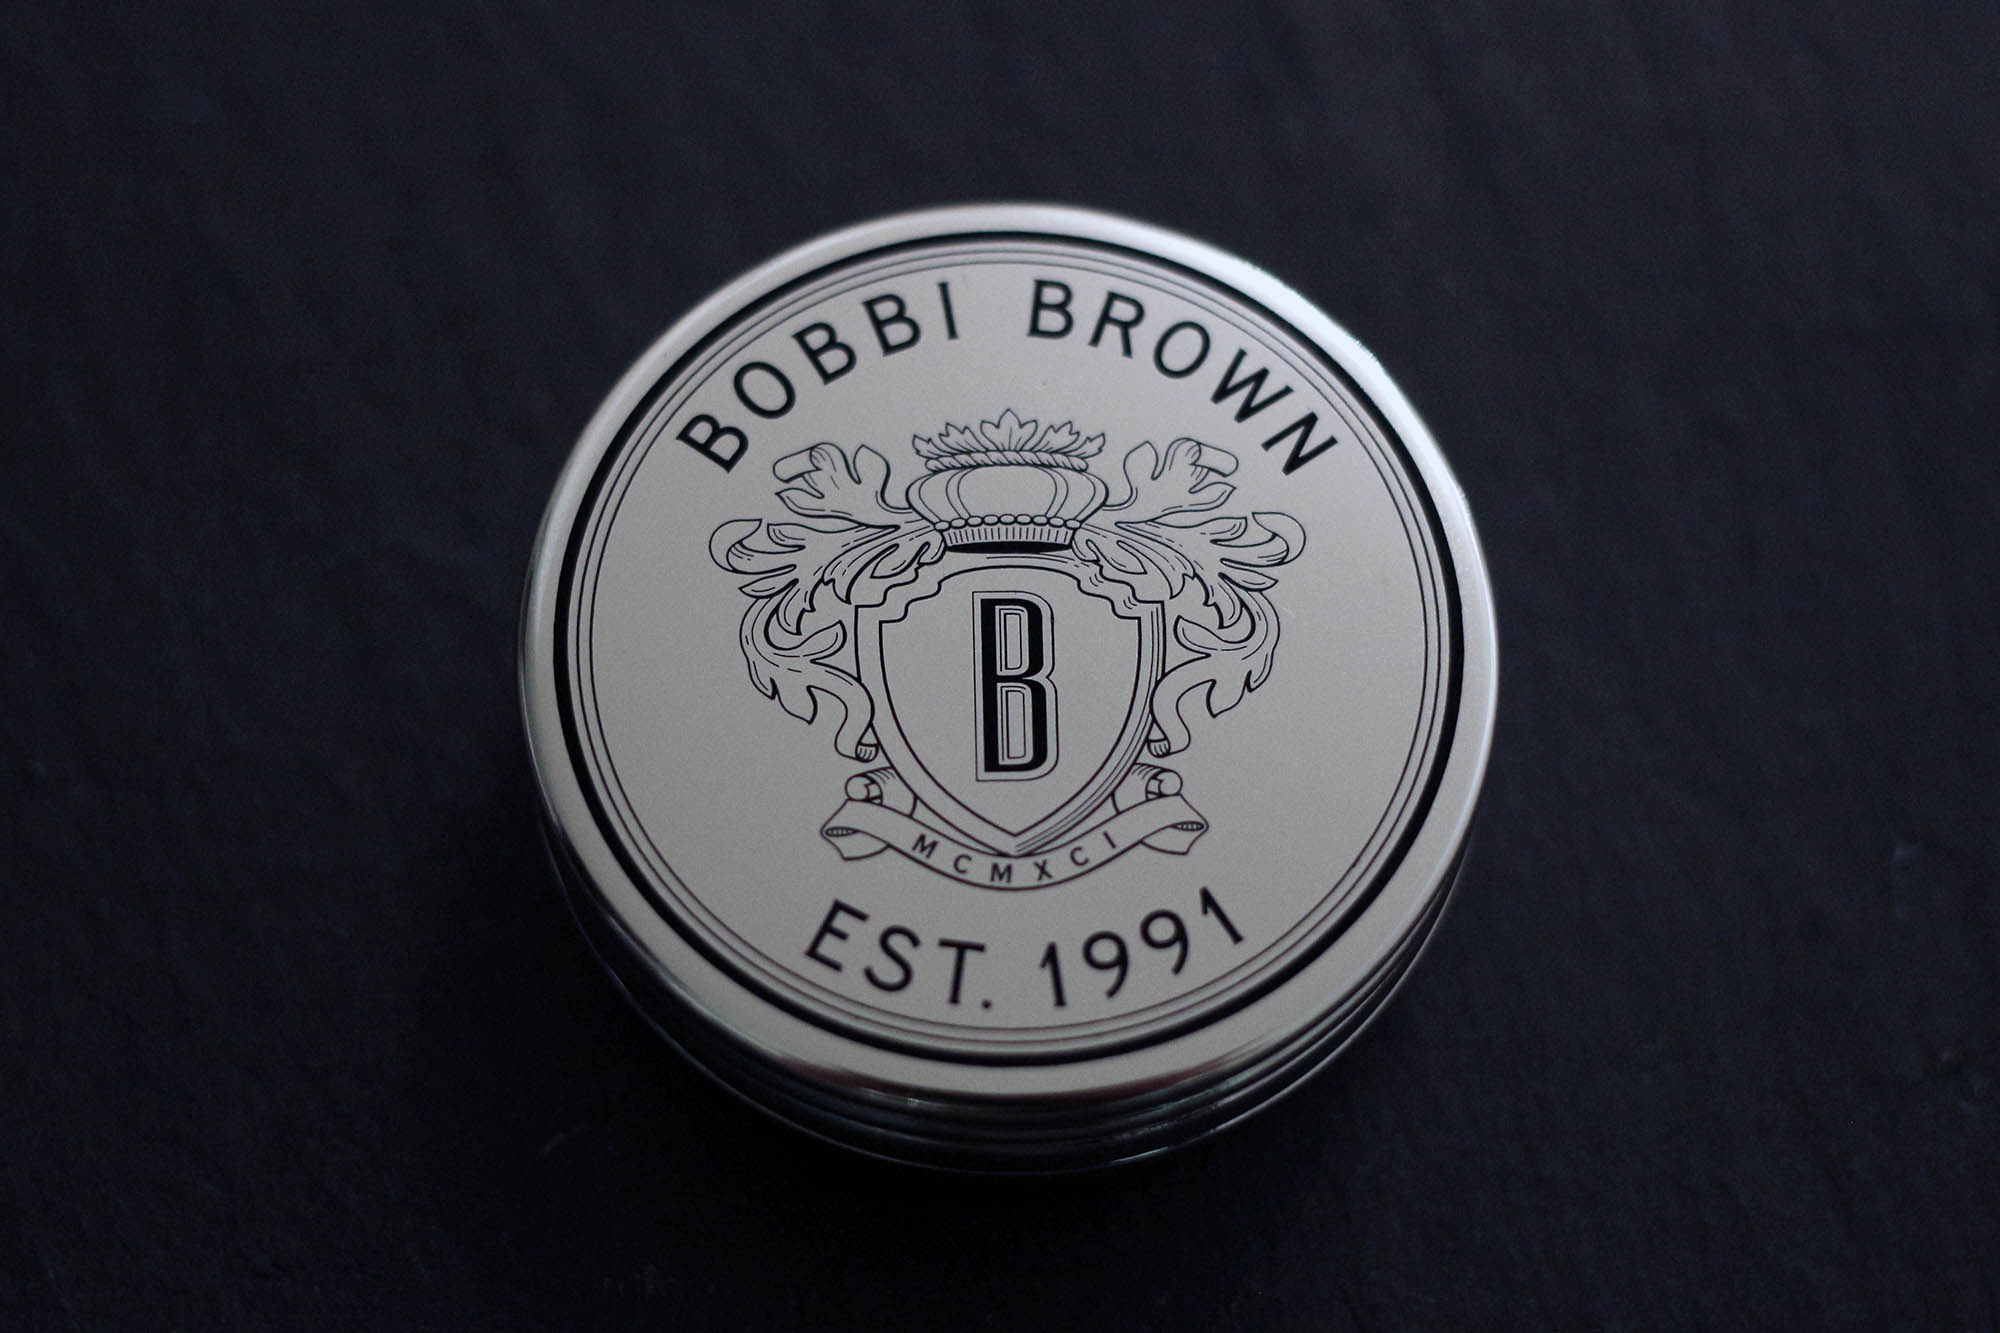 BOBBI BROWN Lipbalm_01